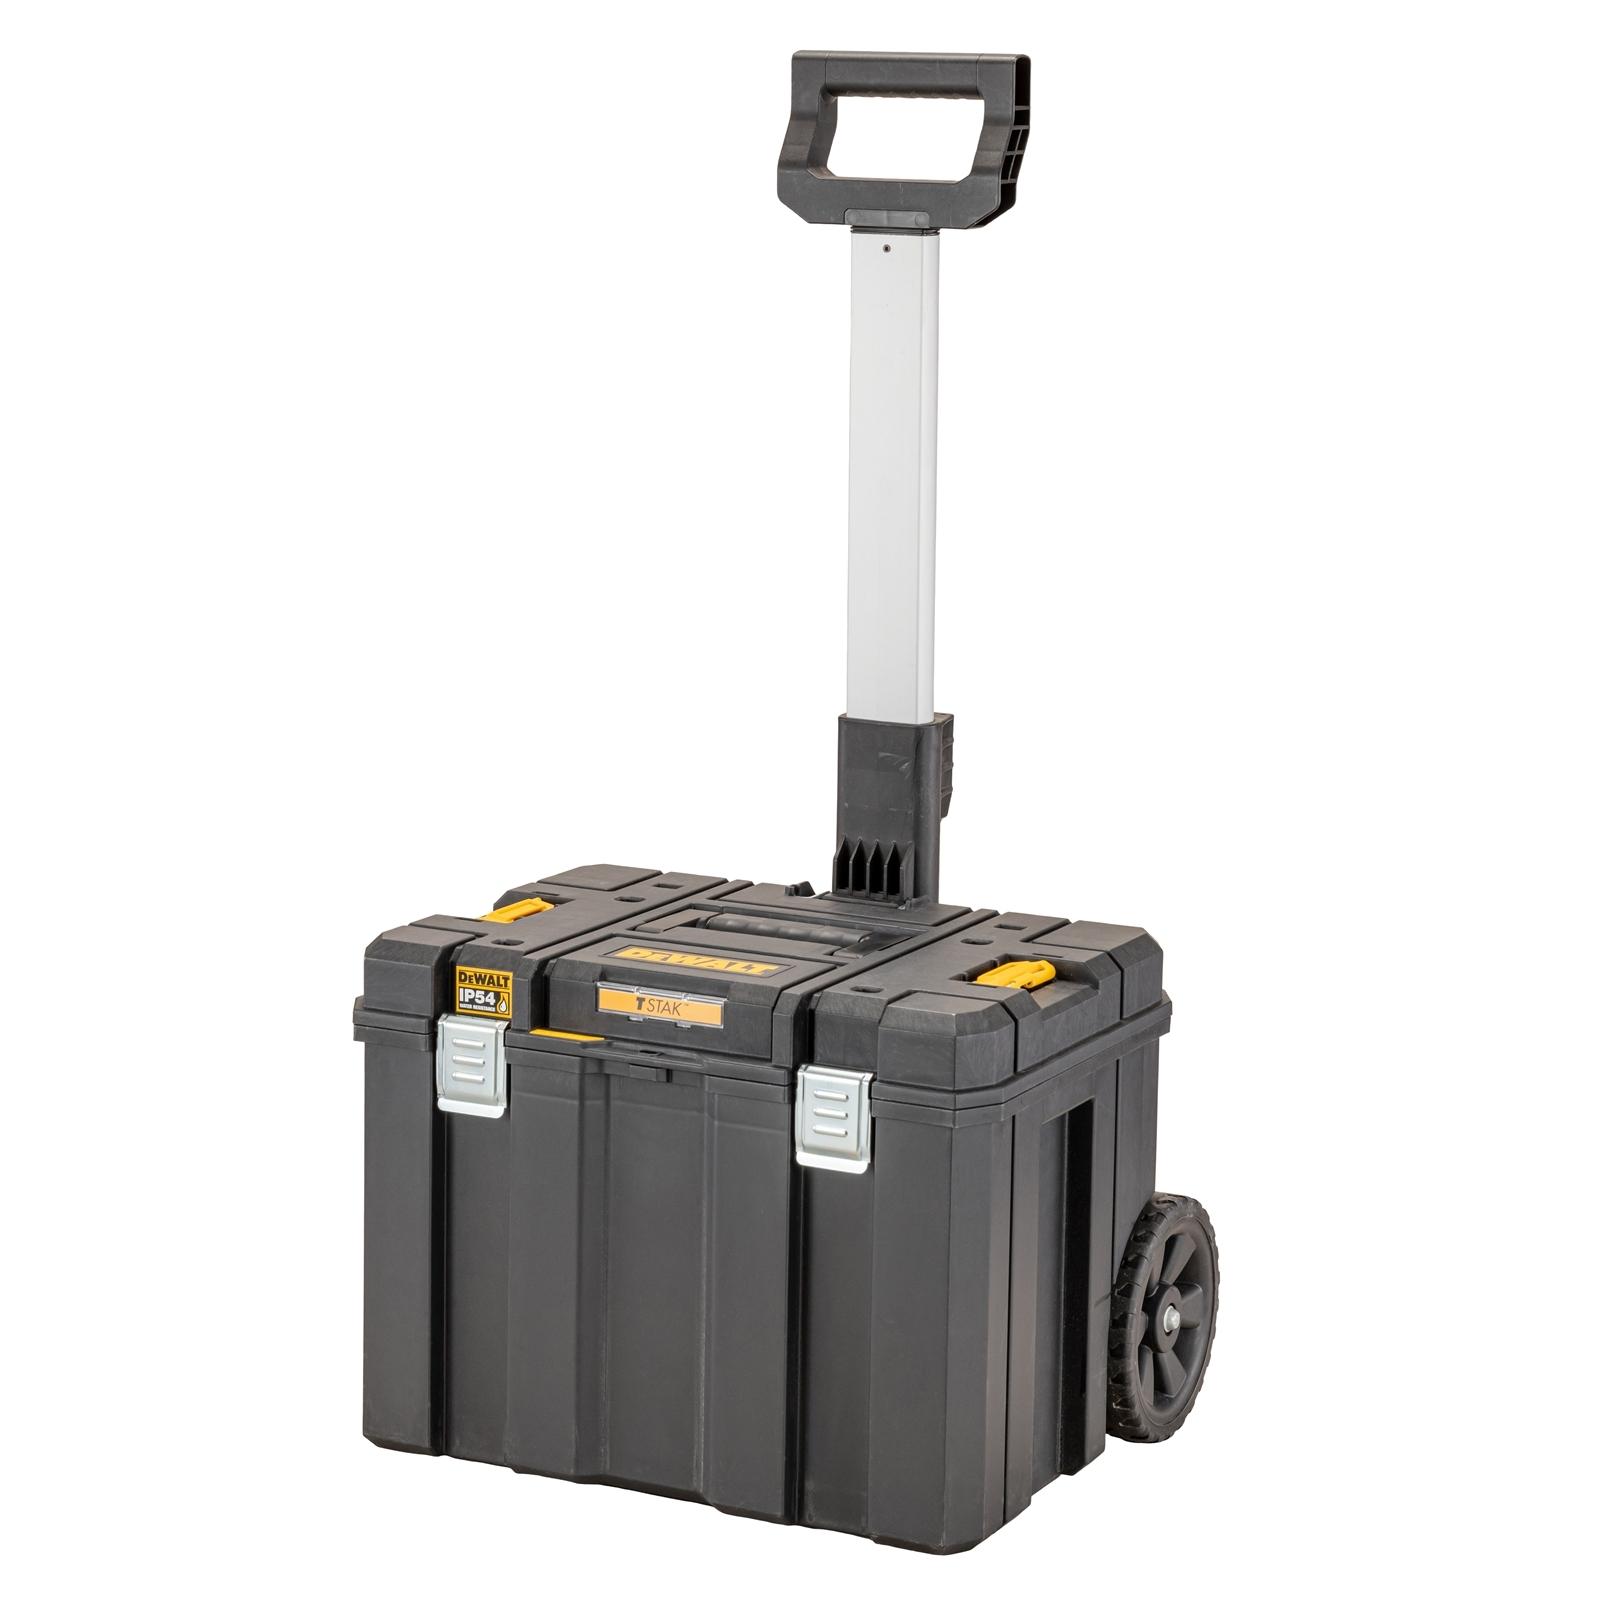 DeWALT TSTAK IP54 Mobile Storage Box